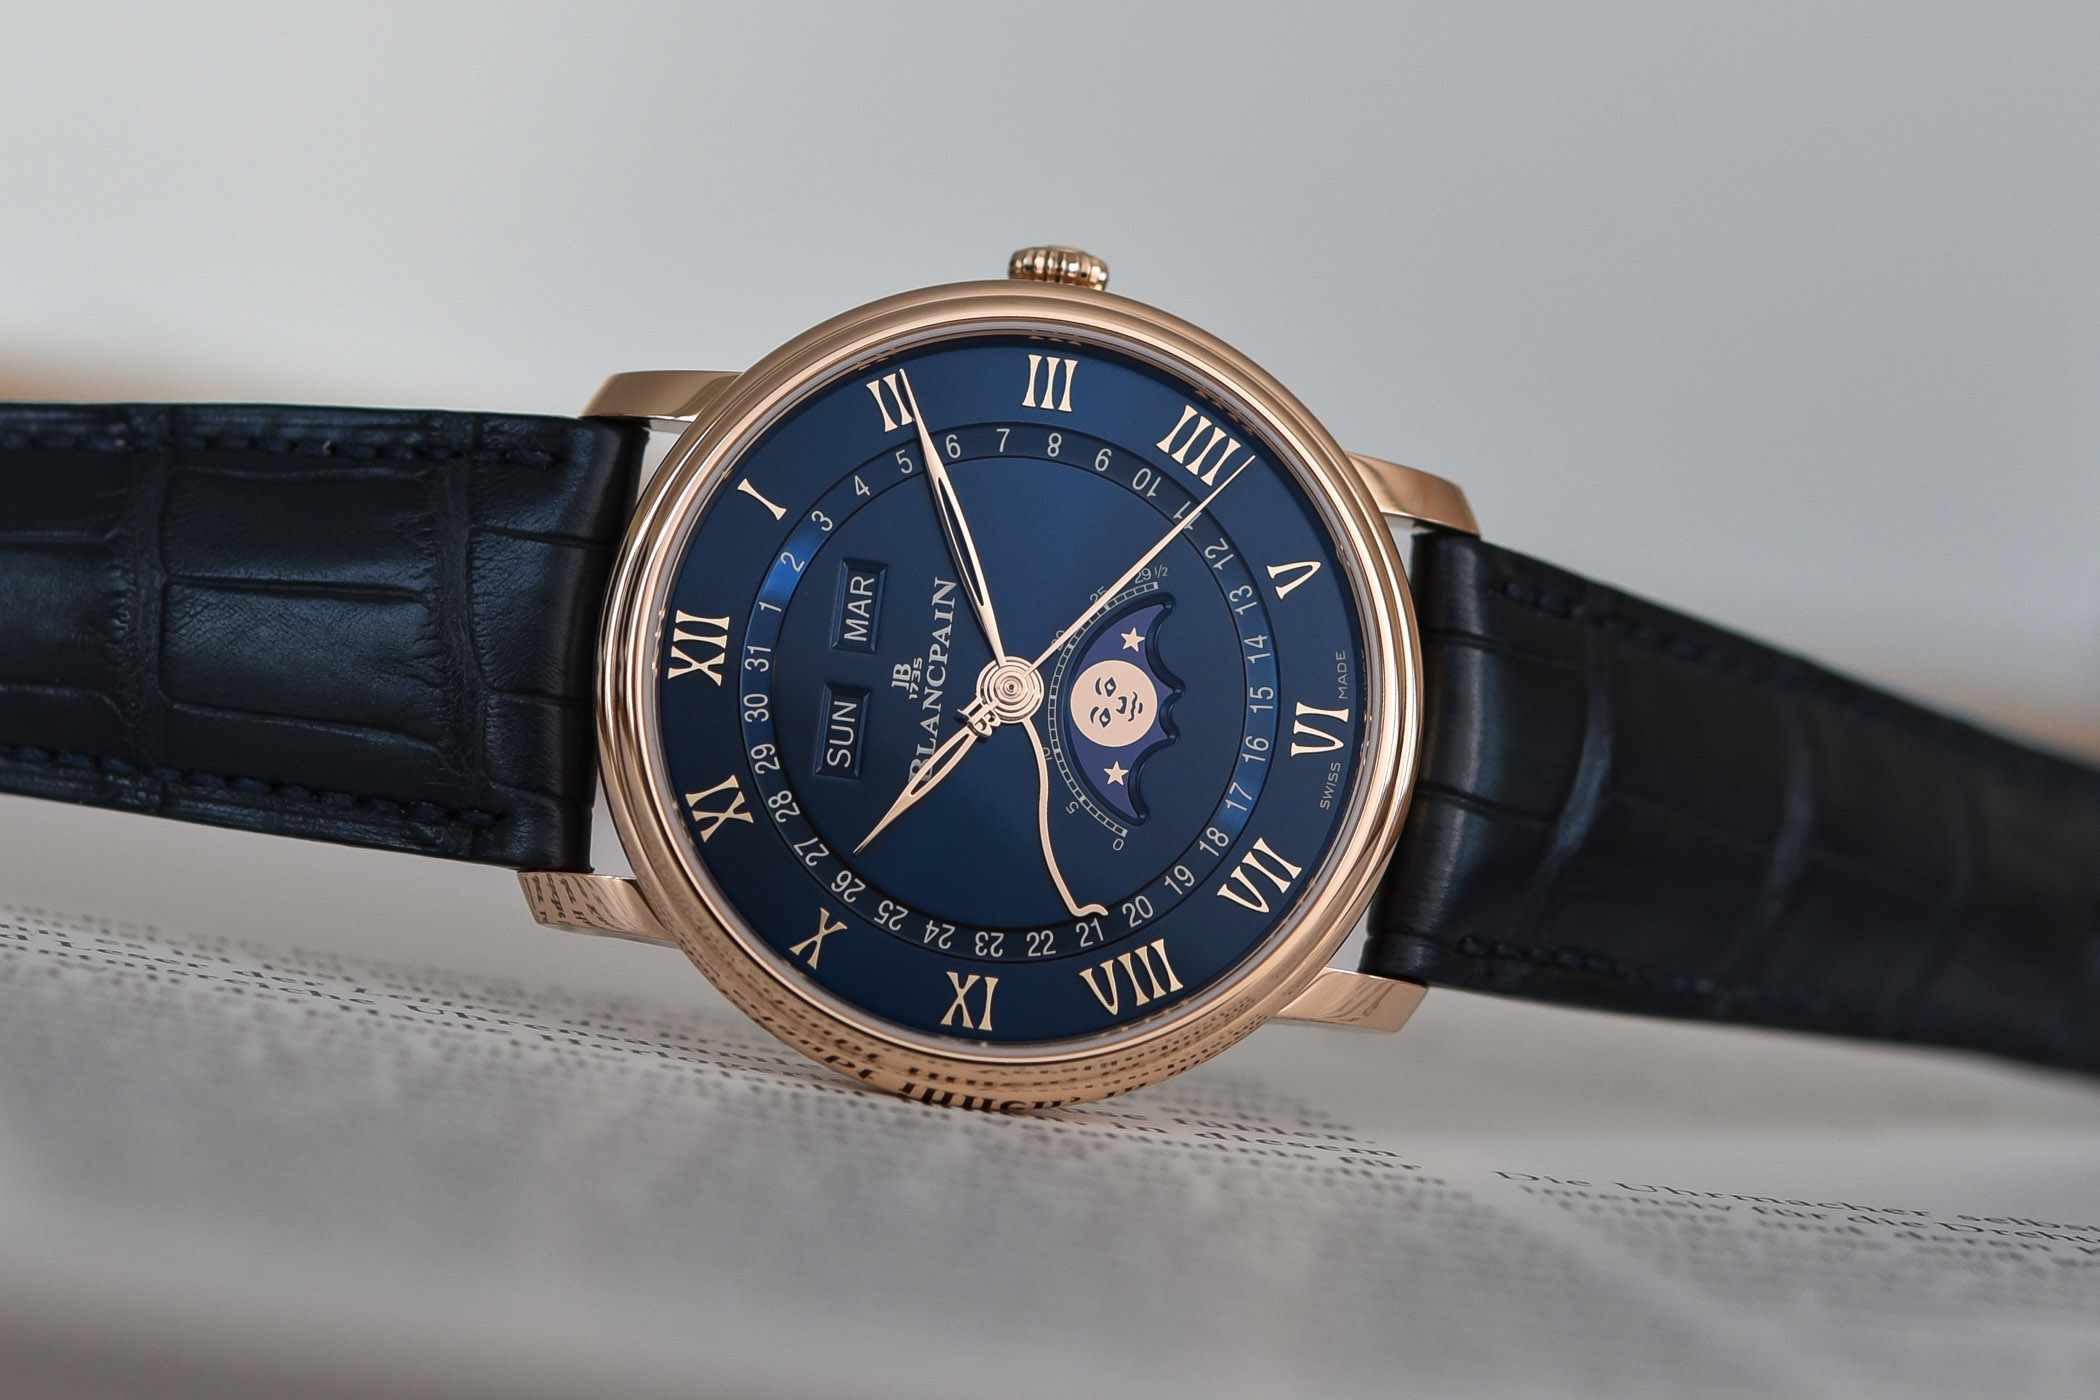 Blancpain Villeret Quantieme Complet Blue Dial Red Gold 6654 3640 55B - Complete Calendar